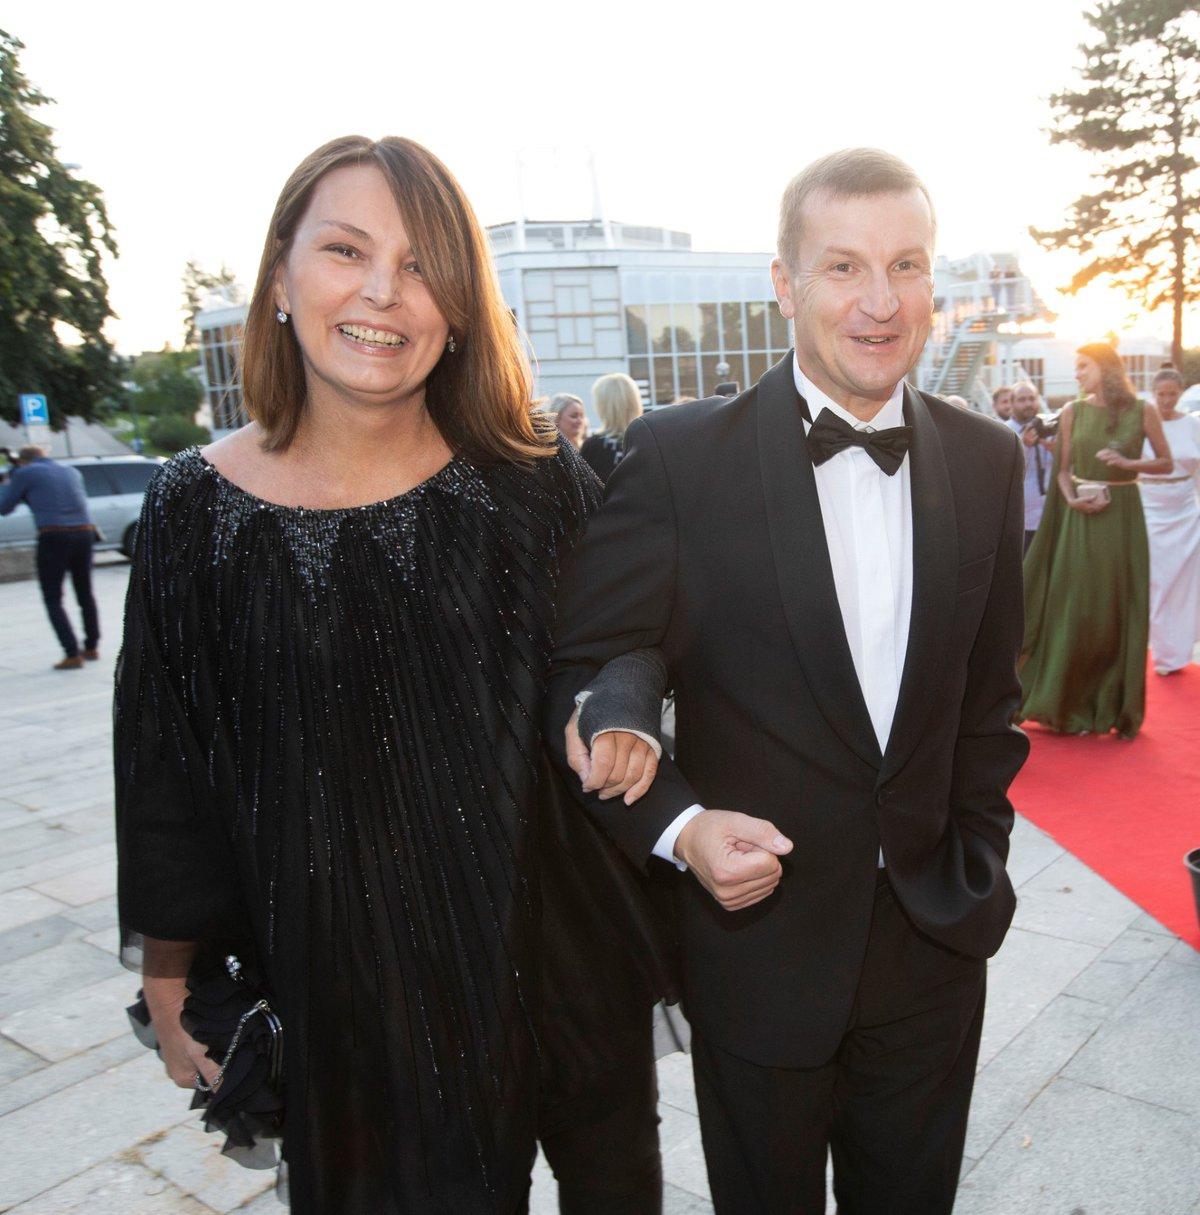 Premiéra muzikálu Čarodějka: Radek Balaš